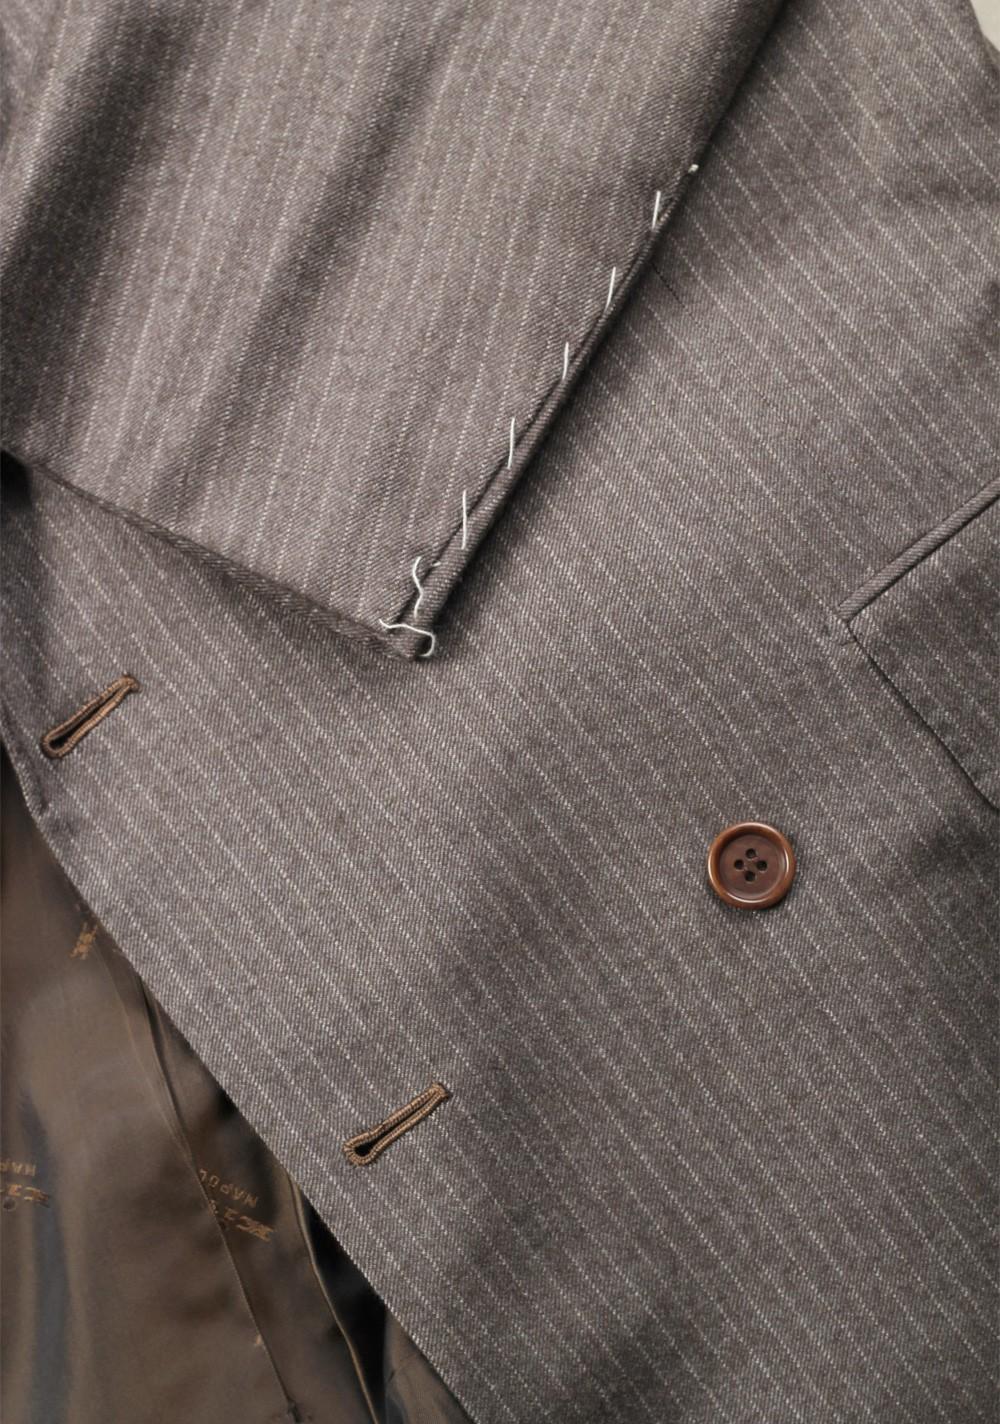 Kiton Suit Size 50 / 40R U.S. 100% Cashmere Double Breasted | Costume Limité